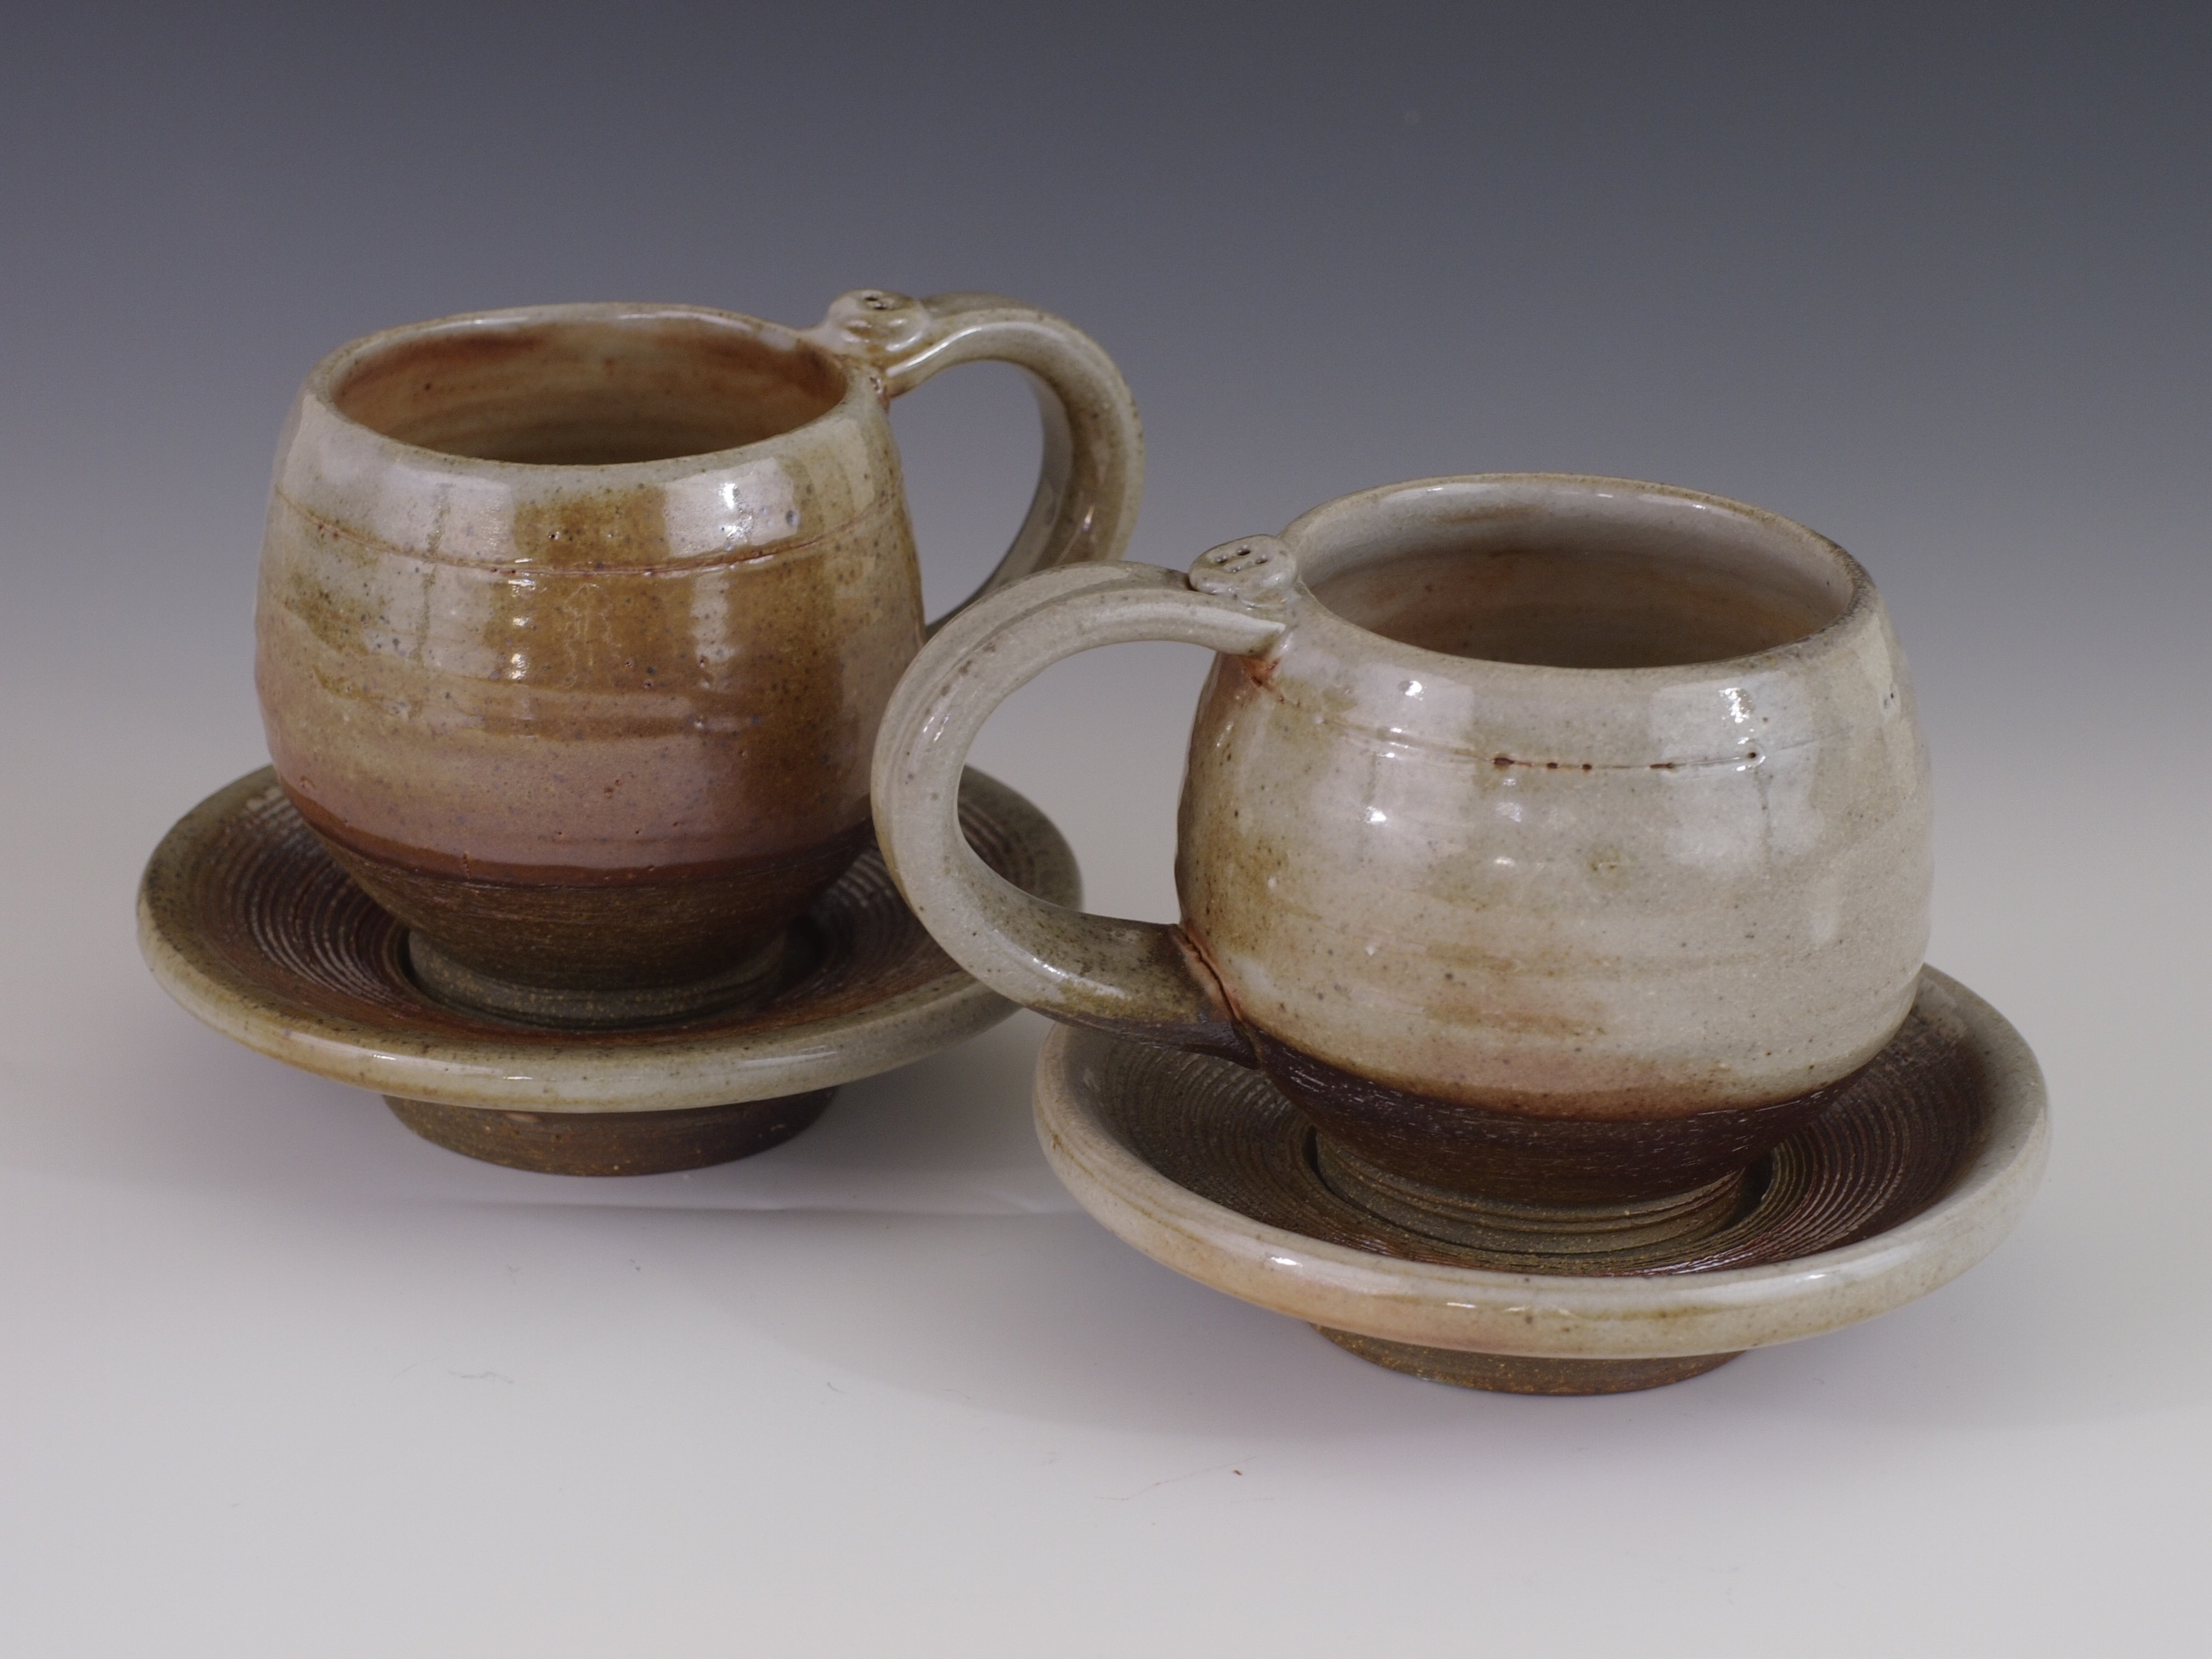 Shino teacups with saucers